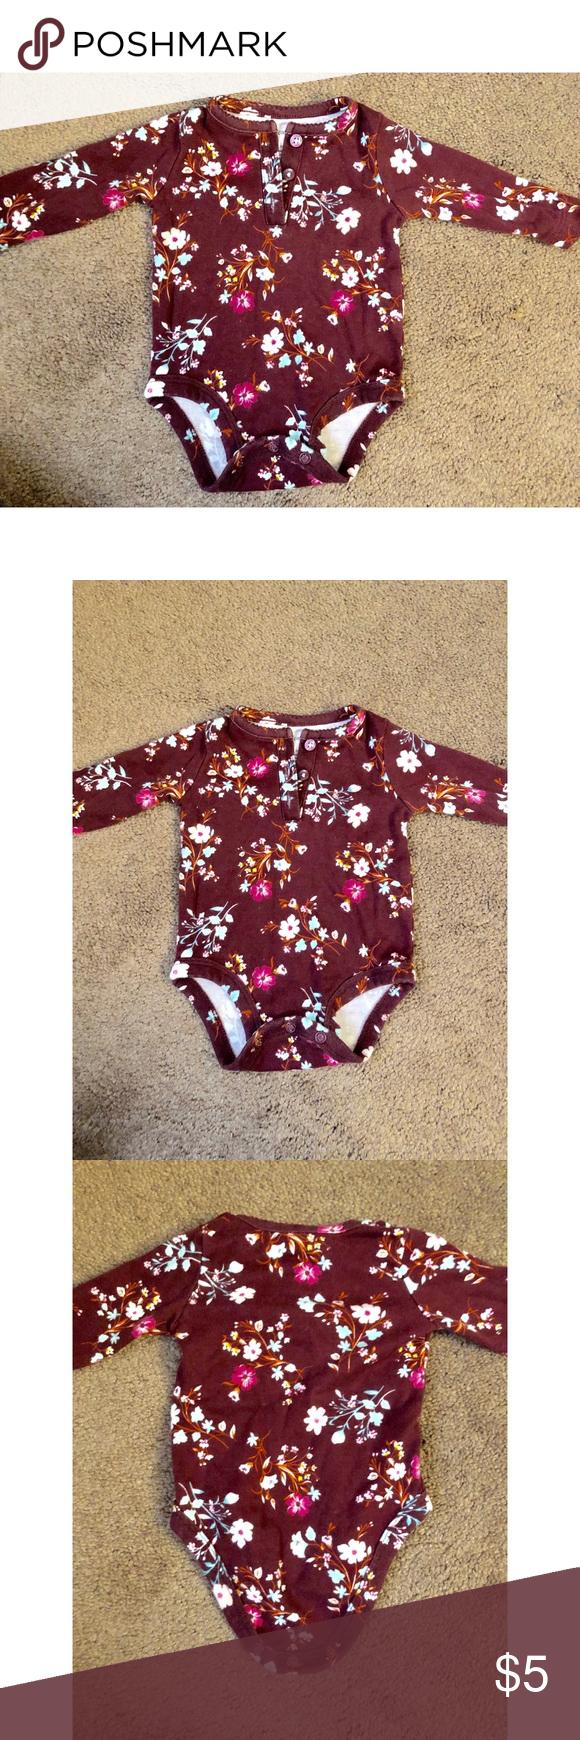 732154527 Burgundy long sleeve floral onesie for babygirl 3m Carter's burgundy long  sleeve onesie. Brand: